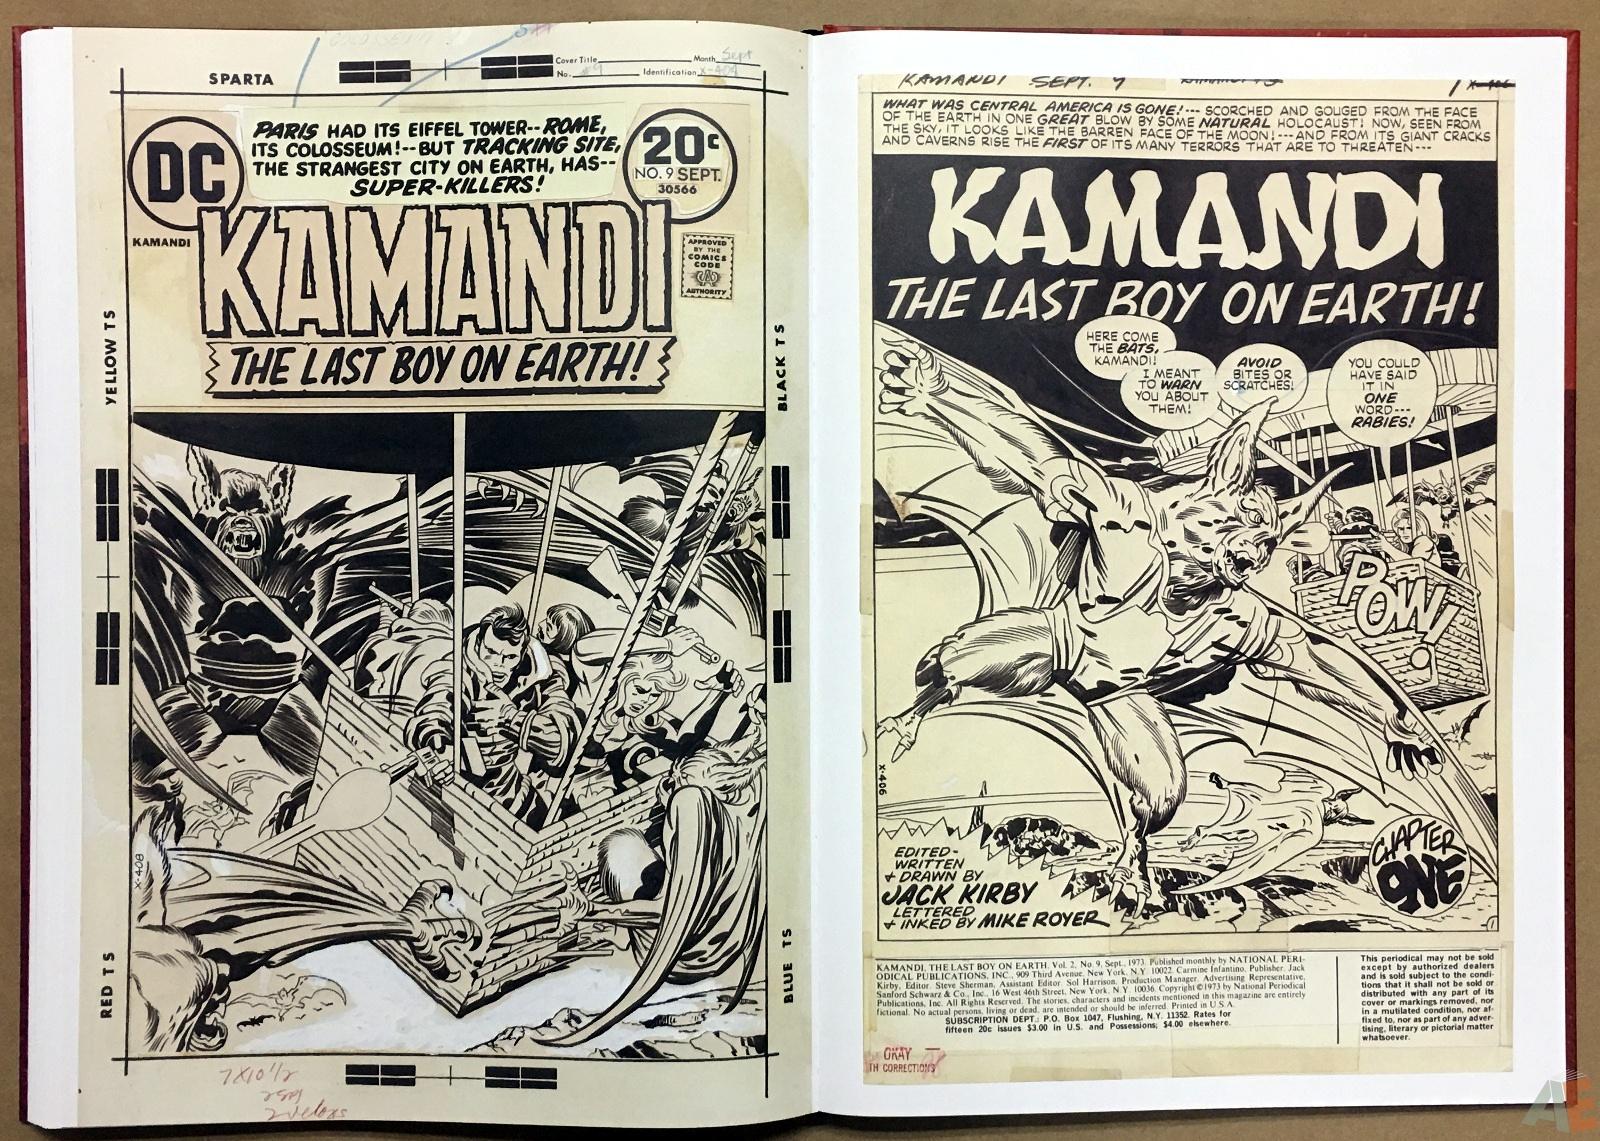 Jack Kirby Kamandi The Last Boy On Earth Artist's Edition 38